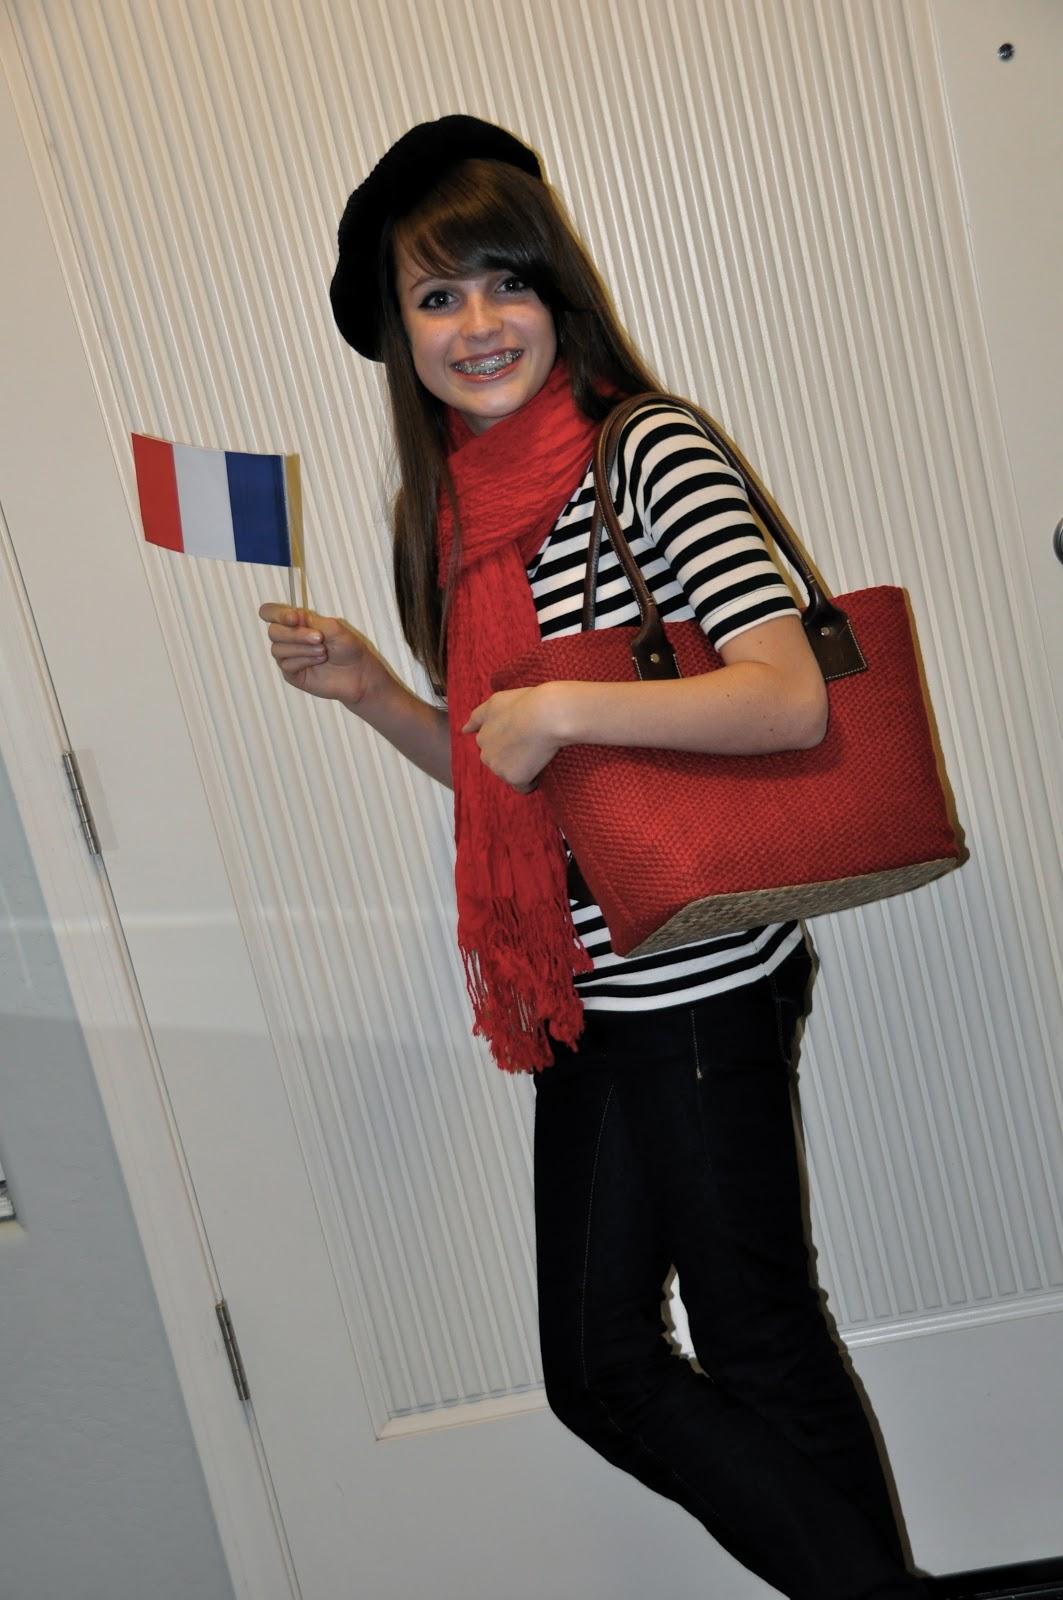 French Woman Halloween Costume orange you glad: you'r...